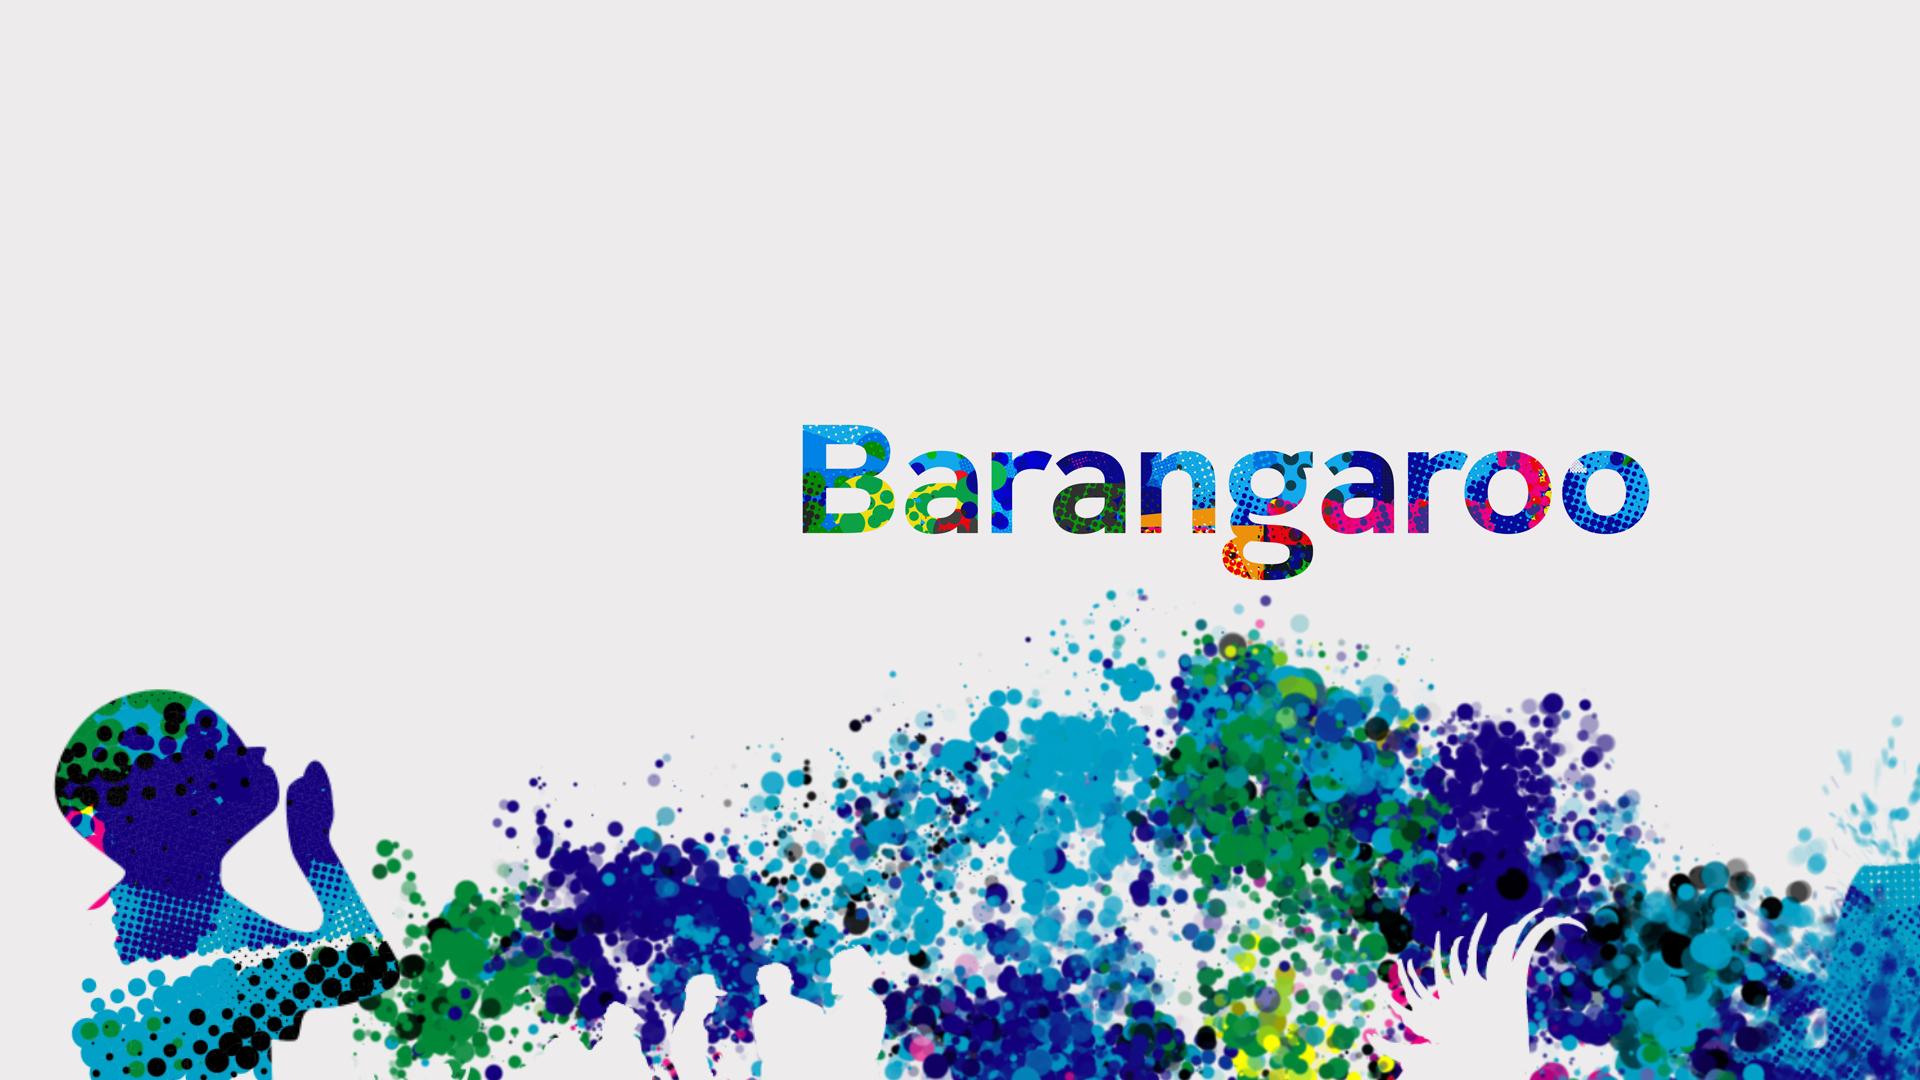 BARANGAROO_1.png